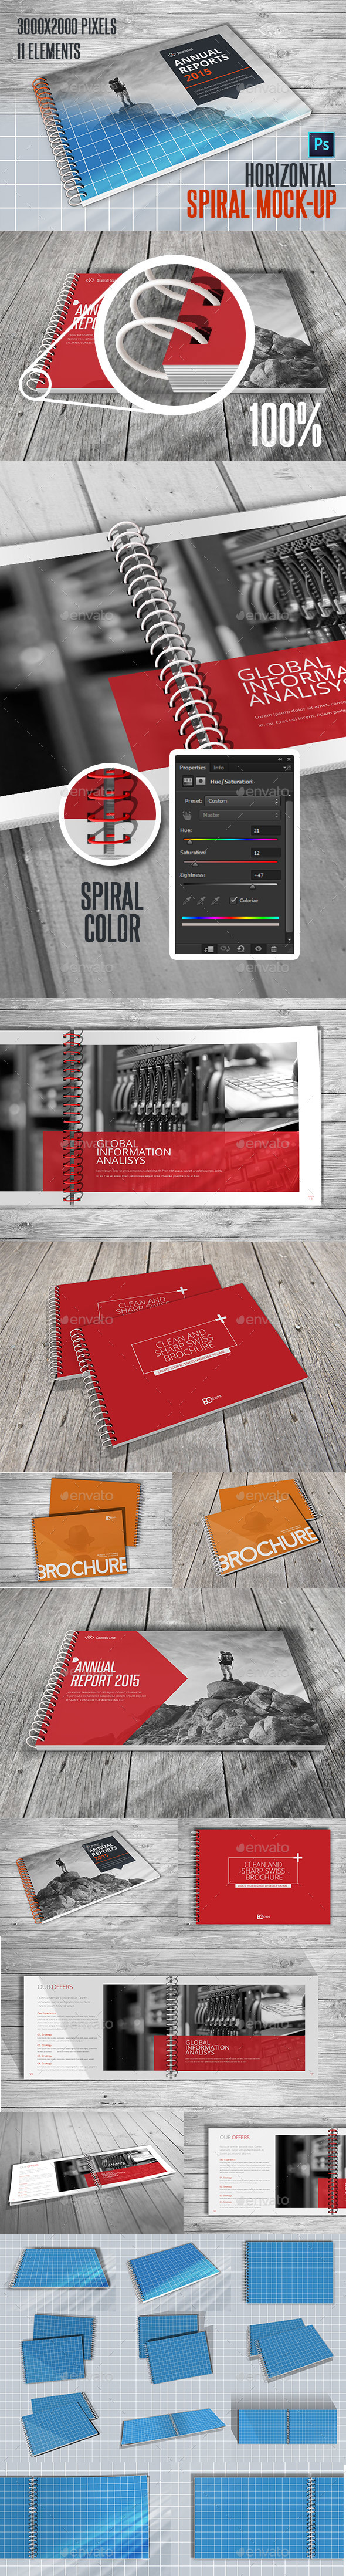 Spiral Horizontal Mockup A4 - Brochures Print